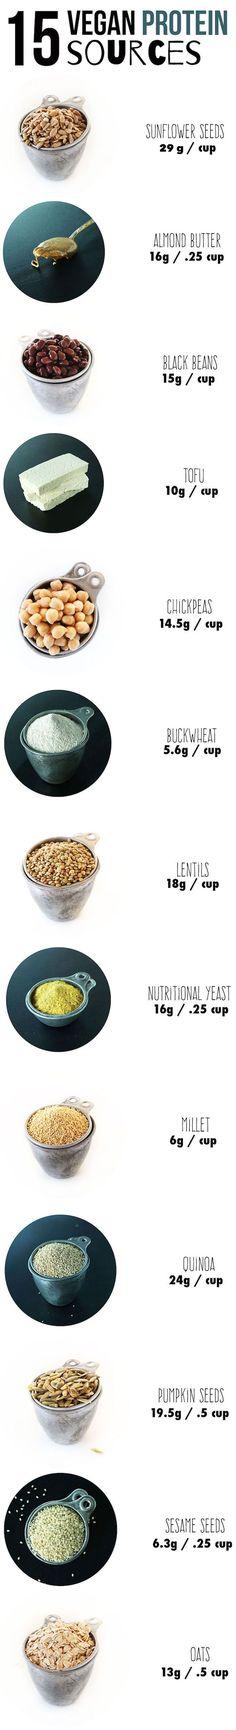 Hummus Toast 15 clean, healthy vegan or protein sources with grams per Serving. clean, healthy vegan or protein sources with grams per Serving. Vegan Protein Sources, Vegetarian Protein, Vegetarian Recipes, Healthy Protein, Protein Power, Protein Recipes, Plat Vegan, Healthy Vegan Breakfast, Think Food